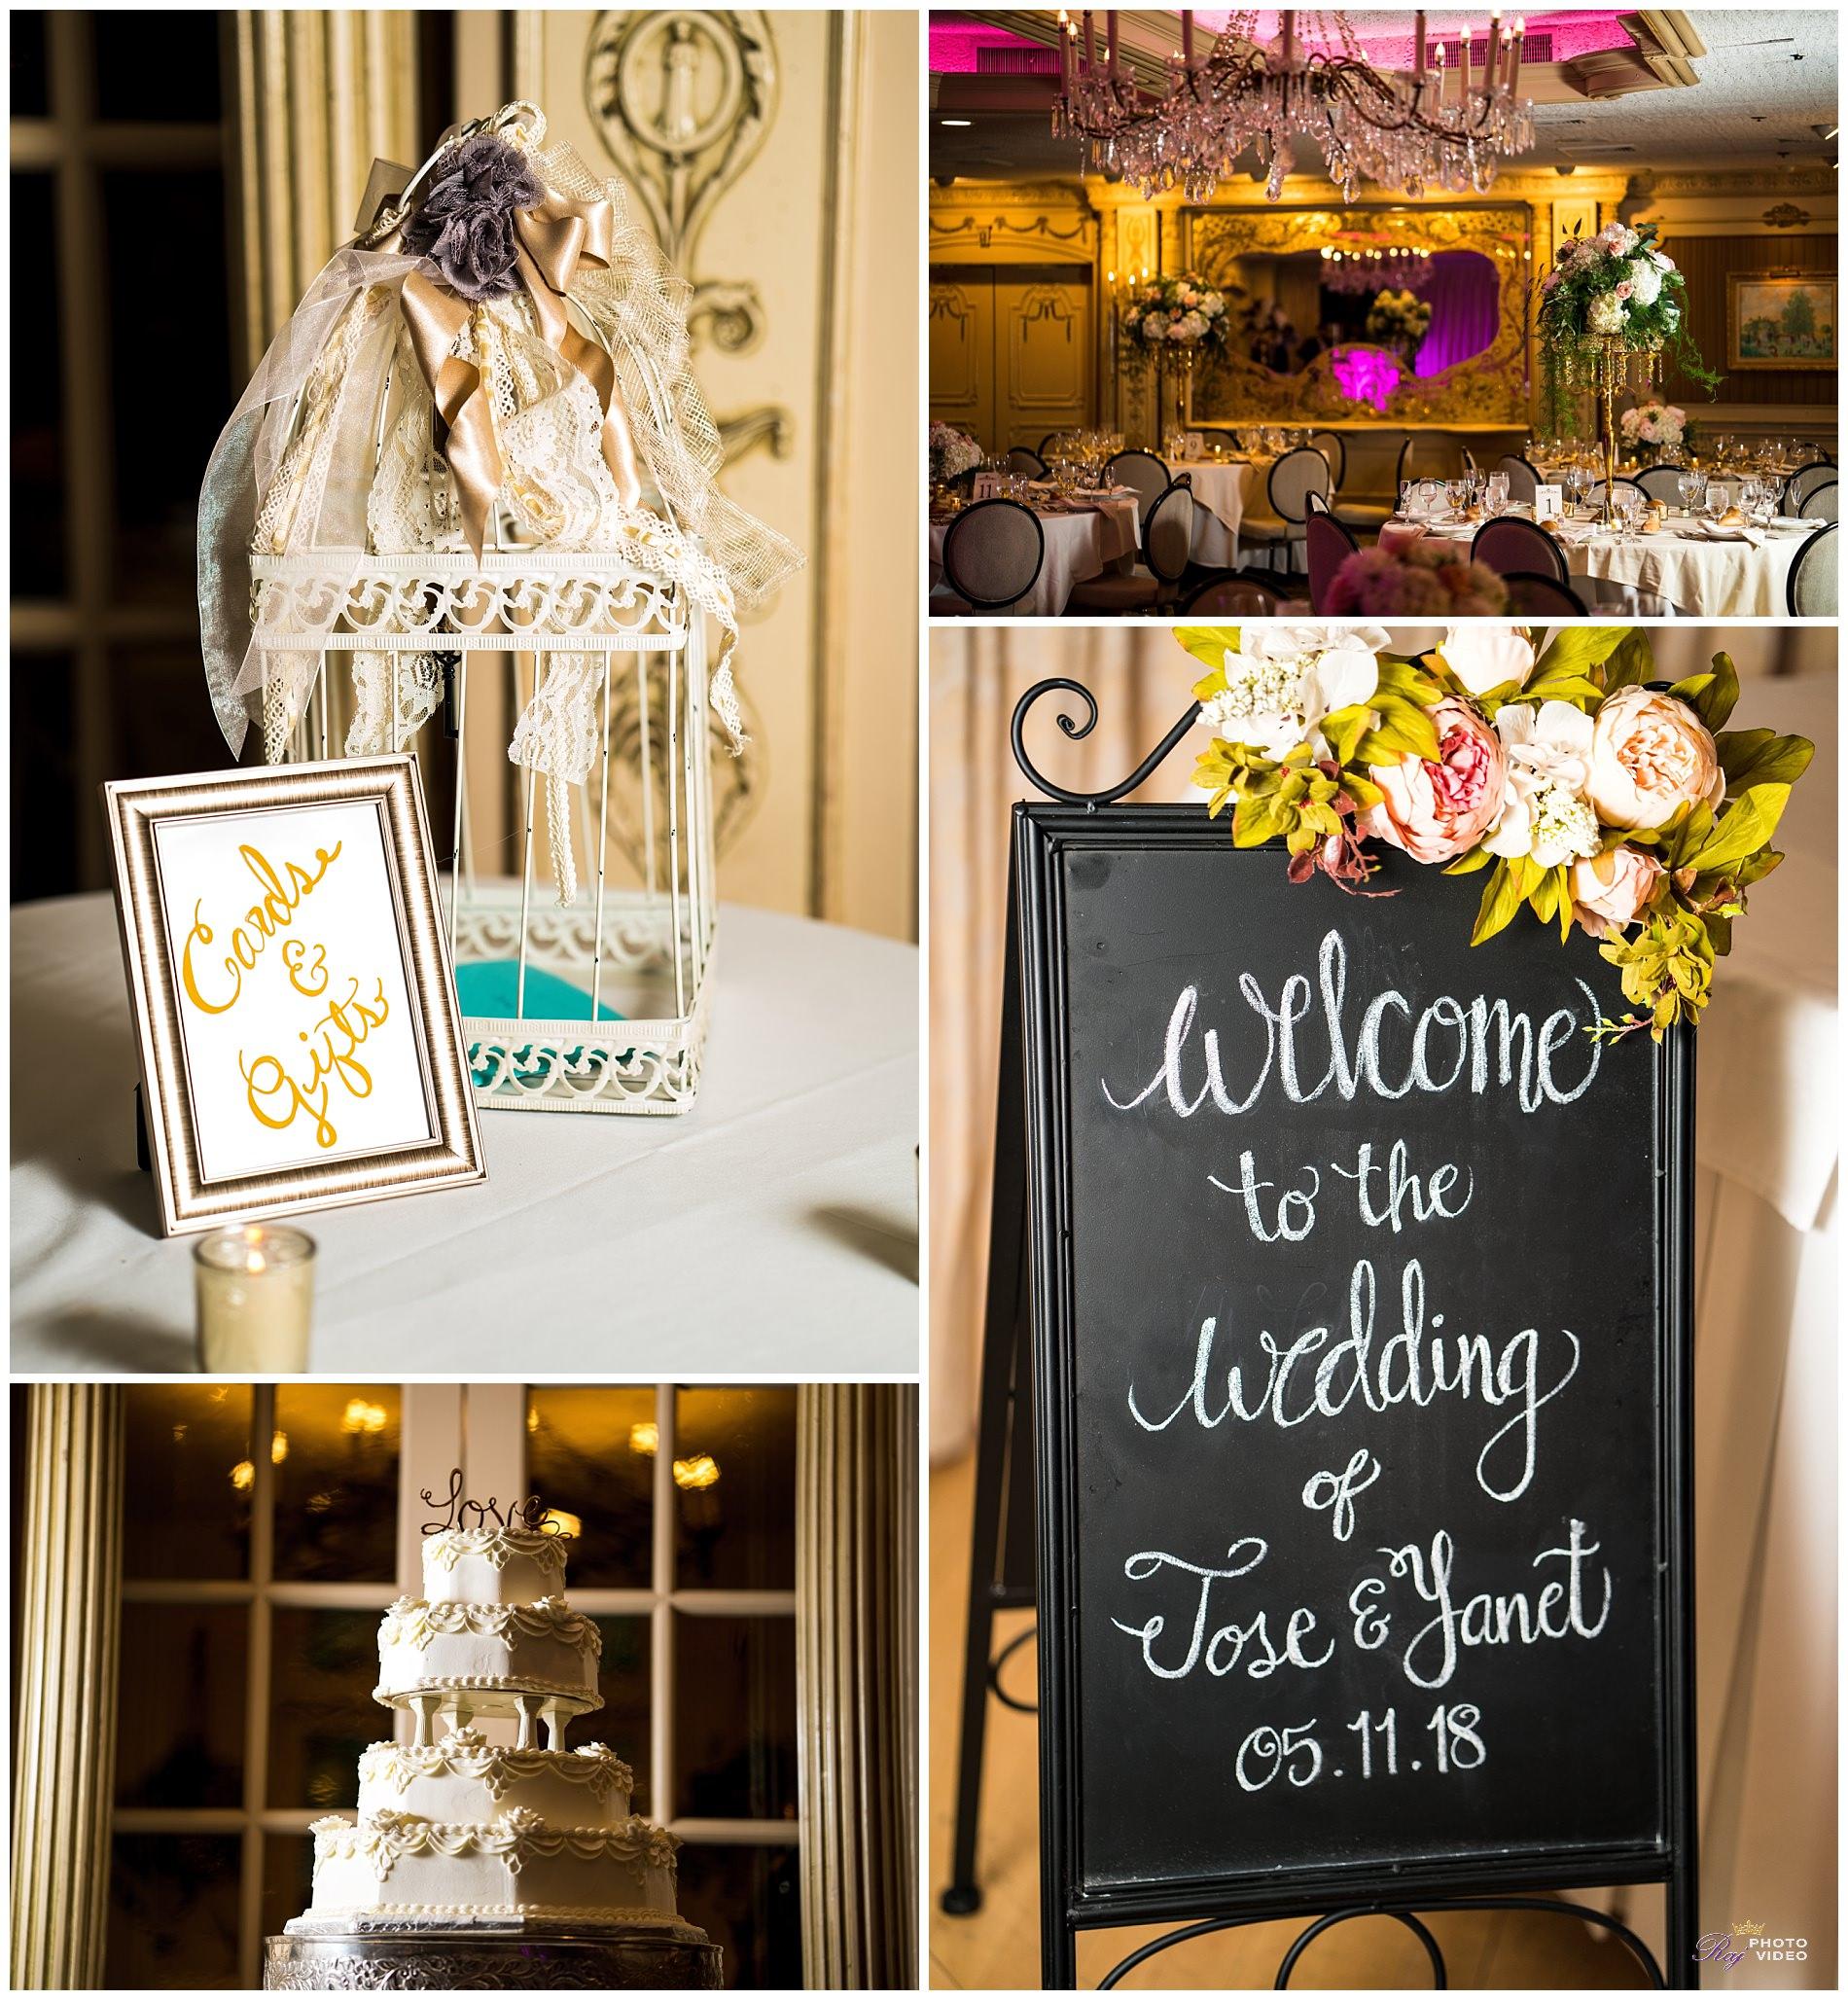 The-Manor-West-Orange-NJ-Wedding-Reception-Yanet-Jose-13.jpg